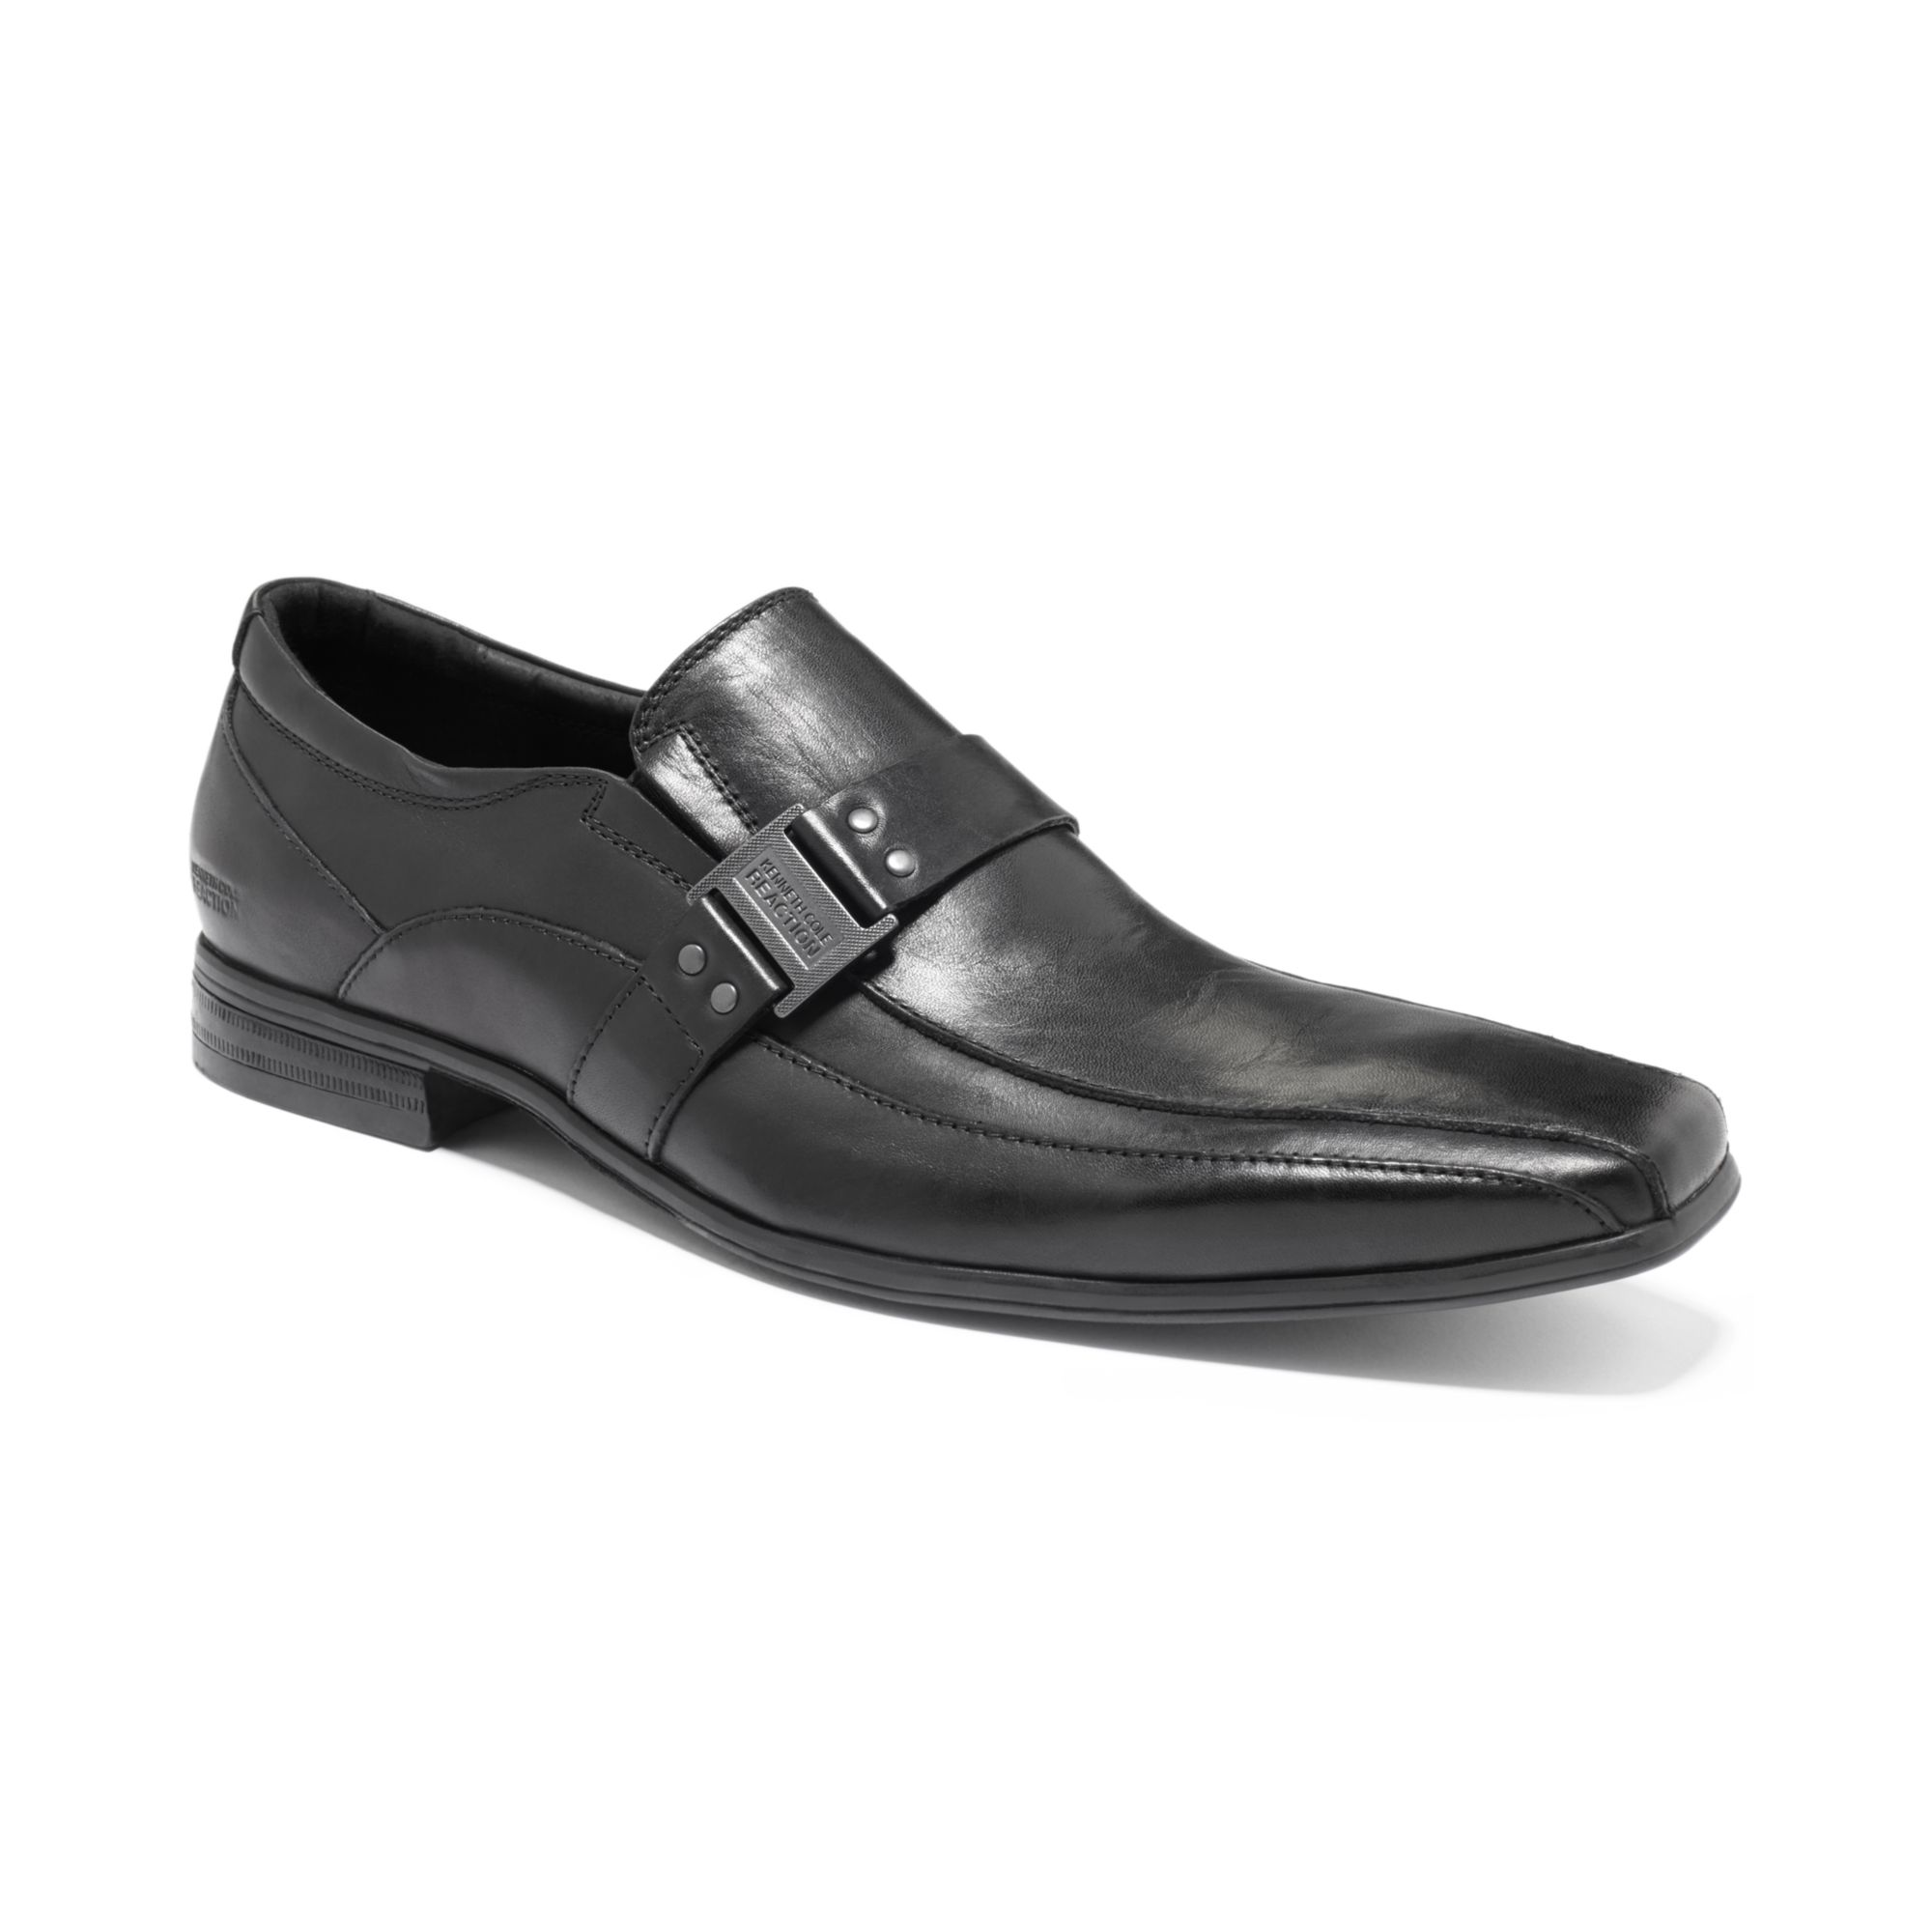 kenneth cole reaction secret message slip on shoes